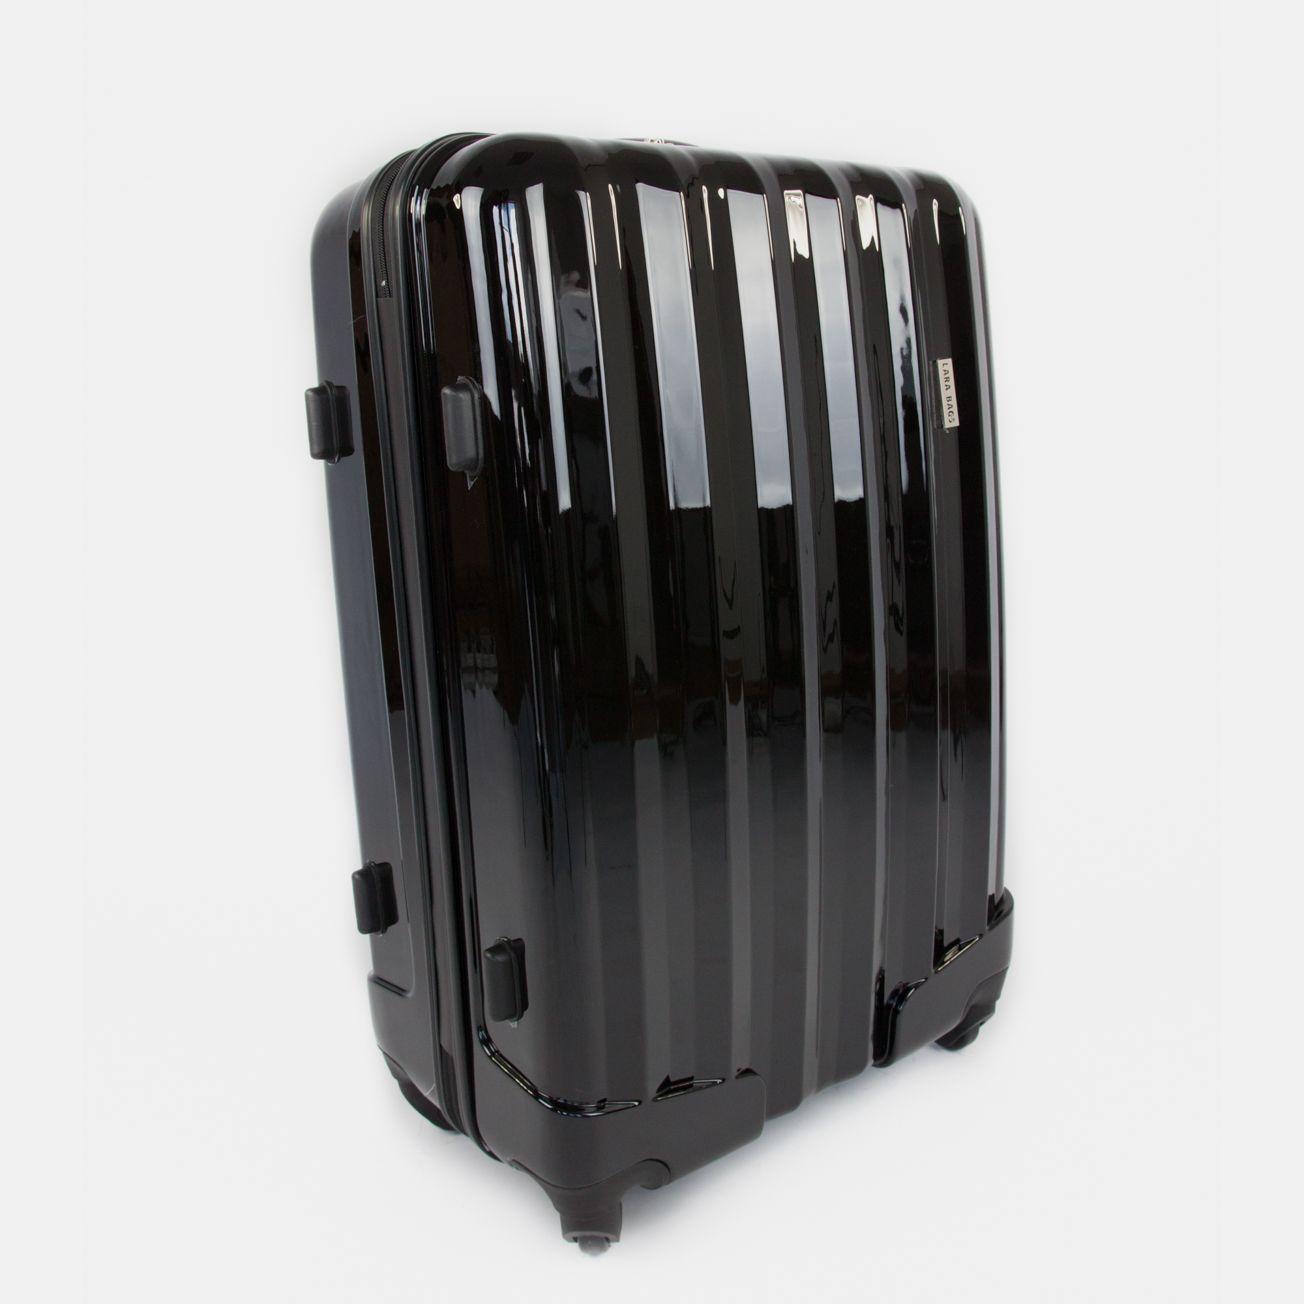 71335b69fb901 Čierny cestovný kufor plastový veľký | Kufre a cestovné tašky ...